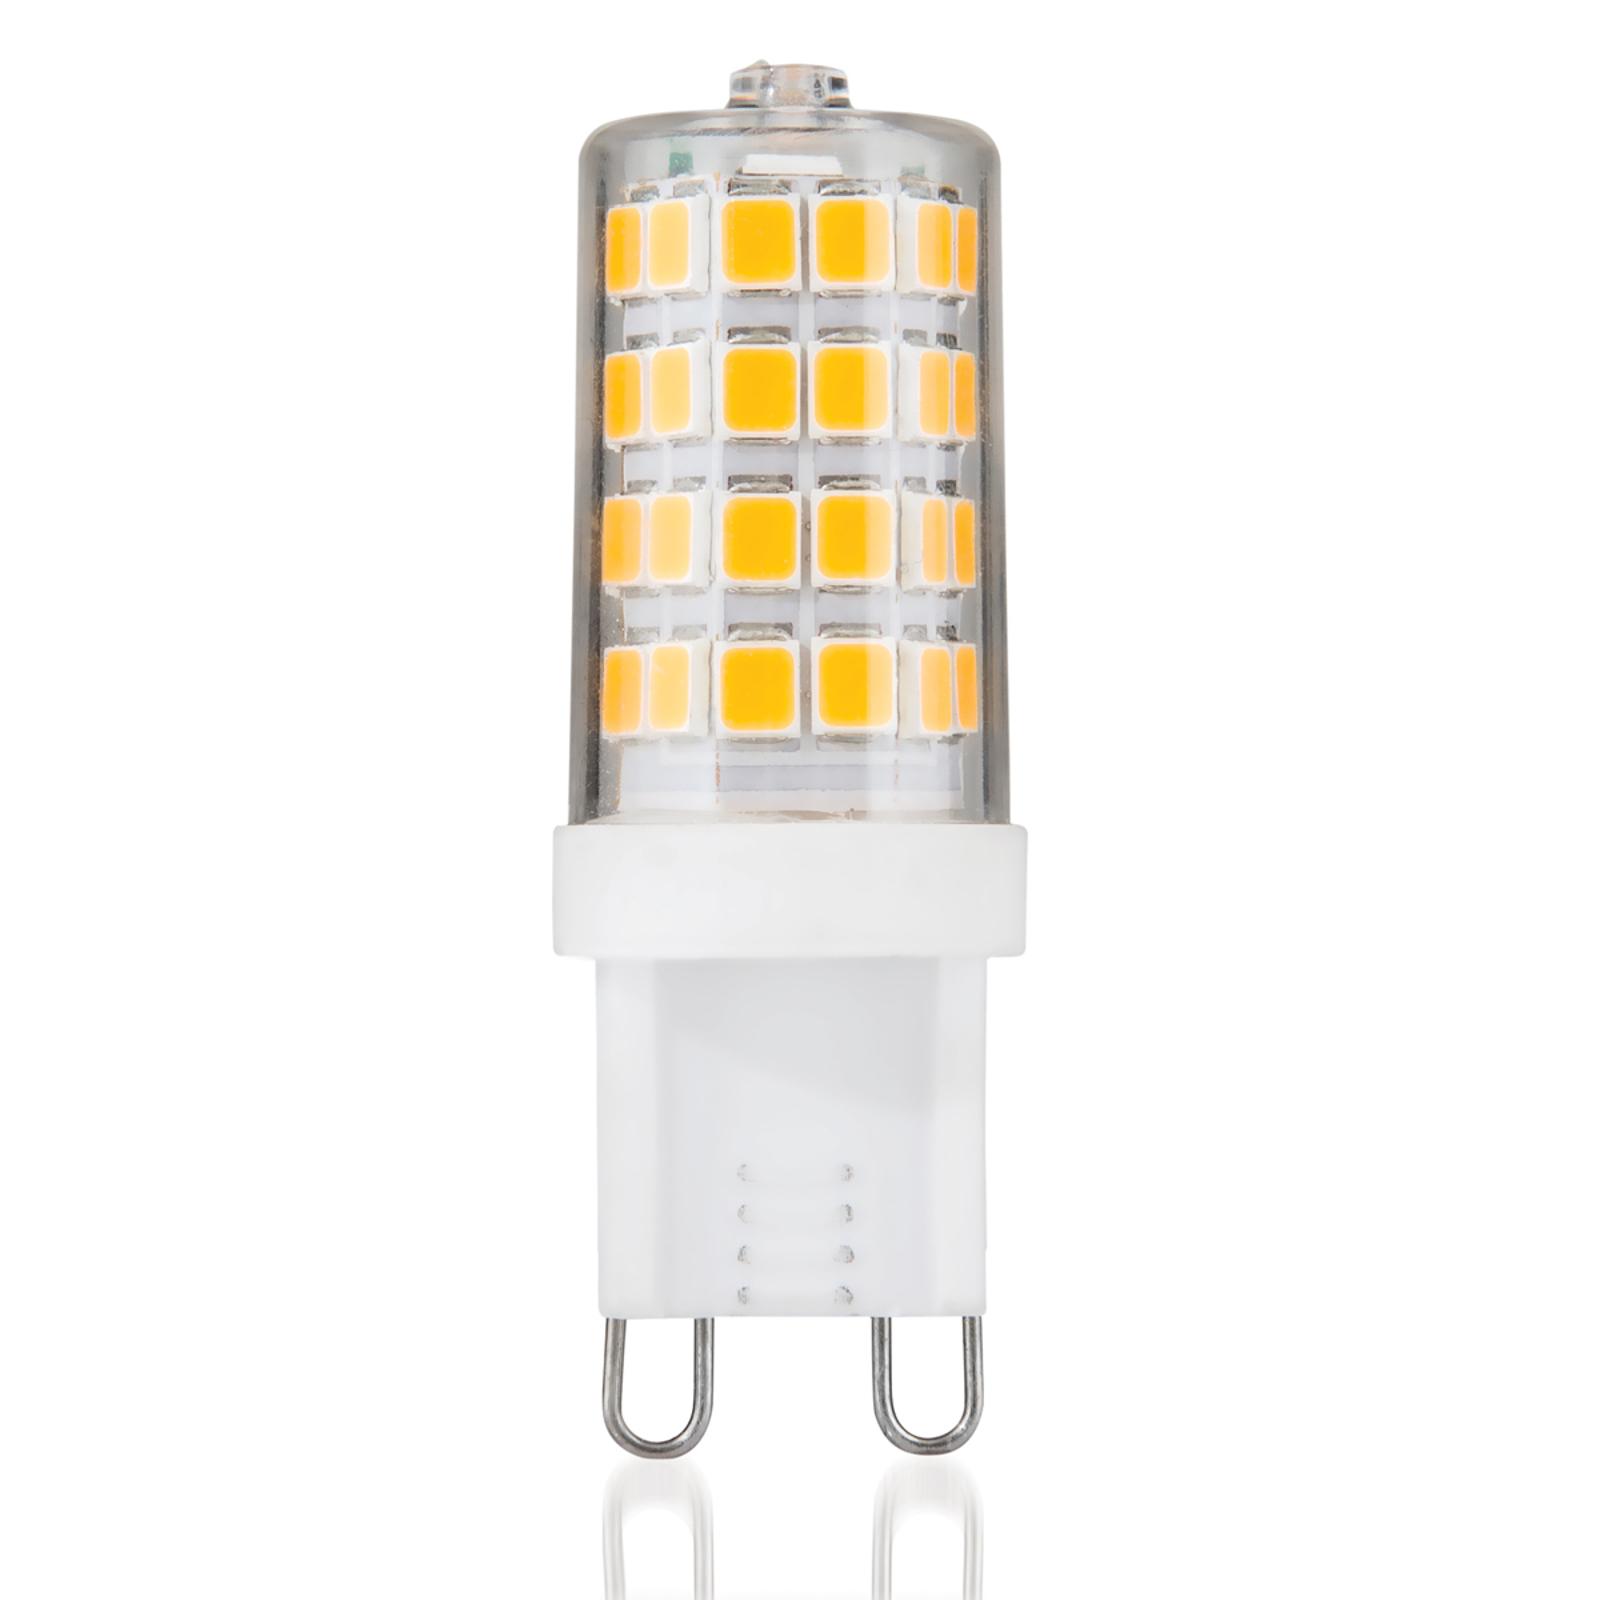 G9 4 W 828 LED bi-pin bulb_7255114_1